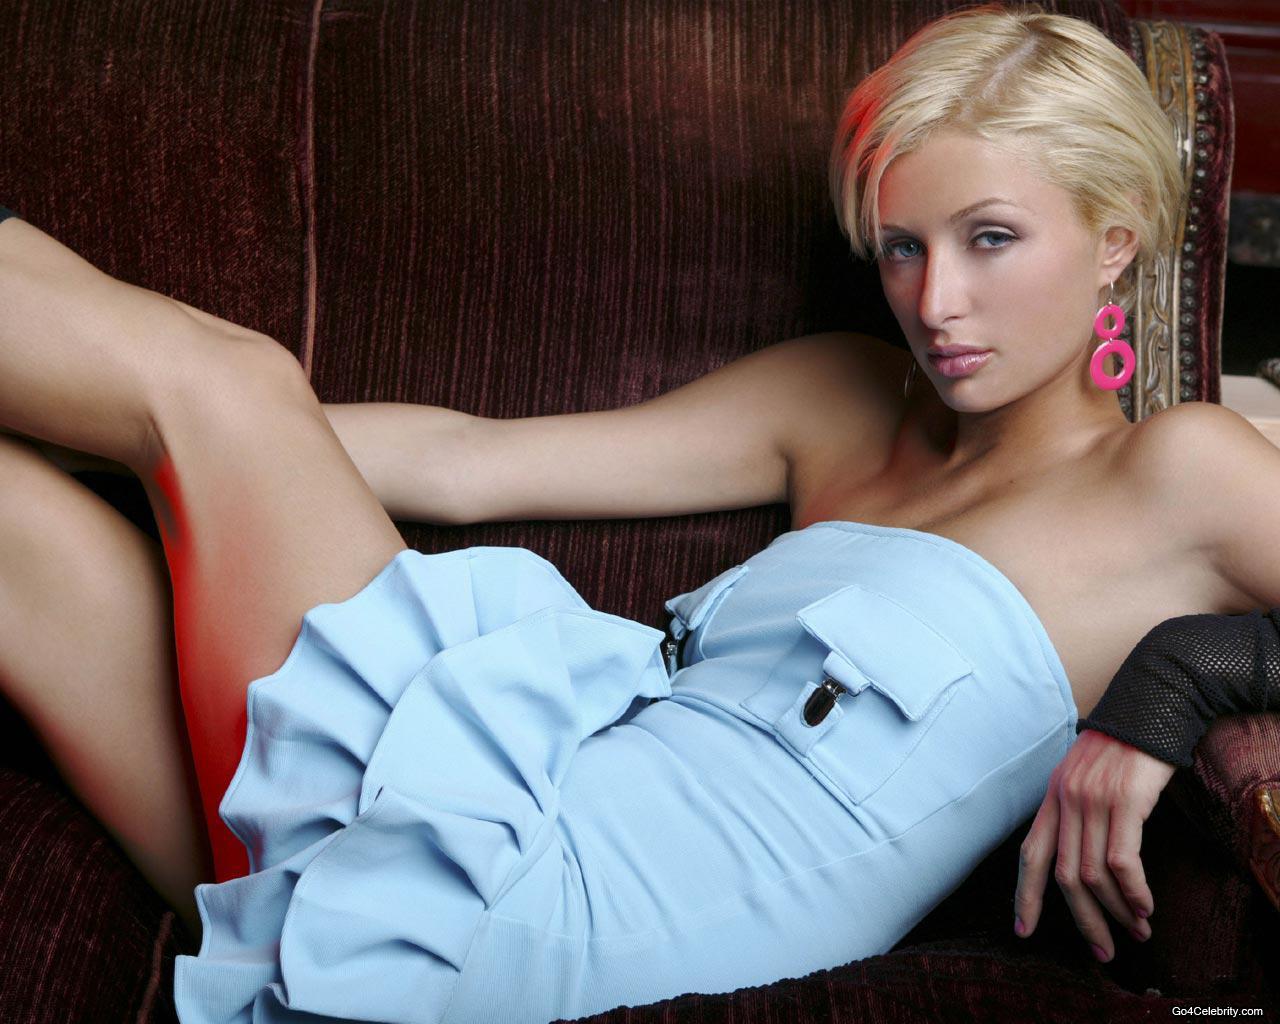 latest meg ryan hot photos world beauty photos. Black Bedroom Furniture Sets. Home Design Ideas